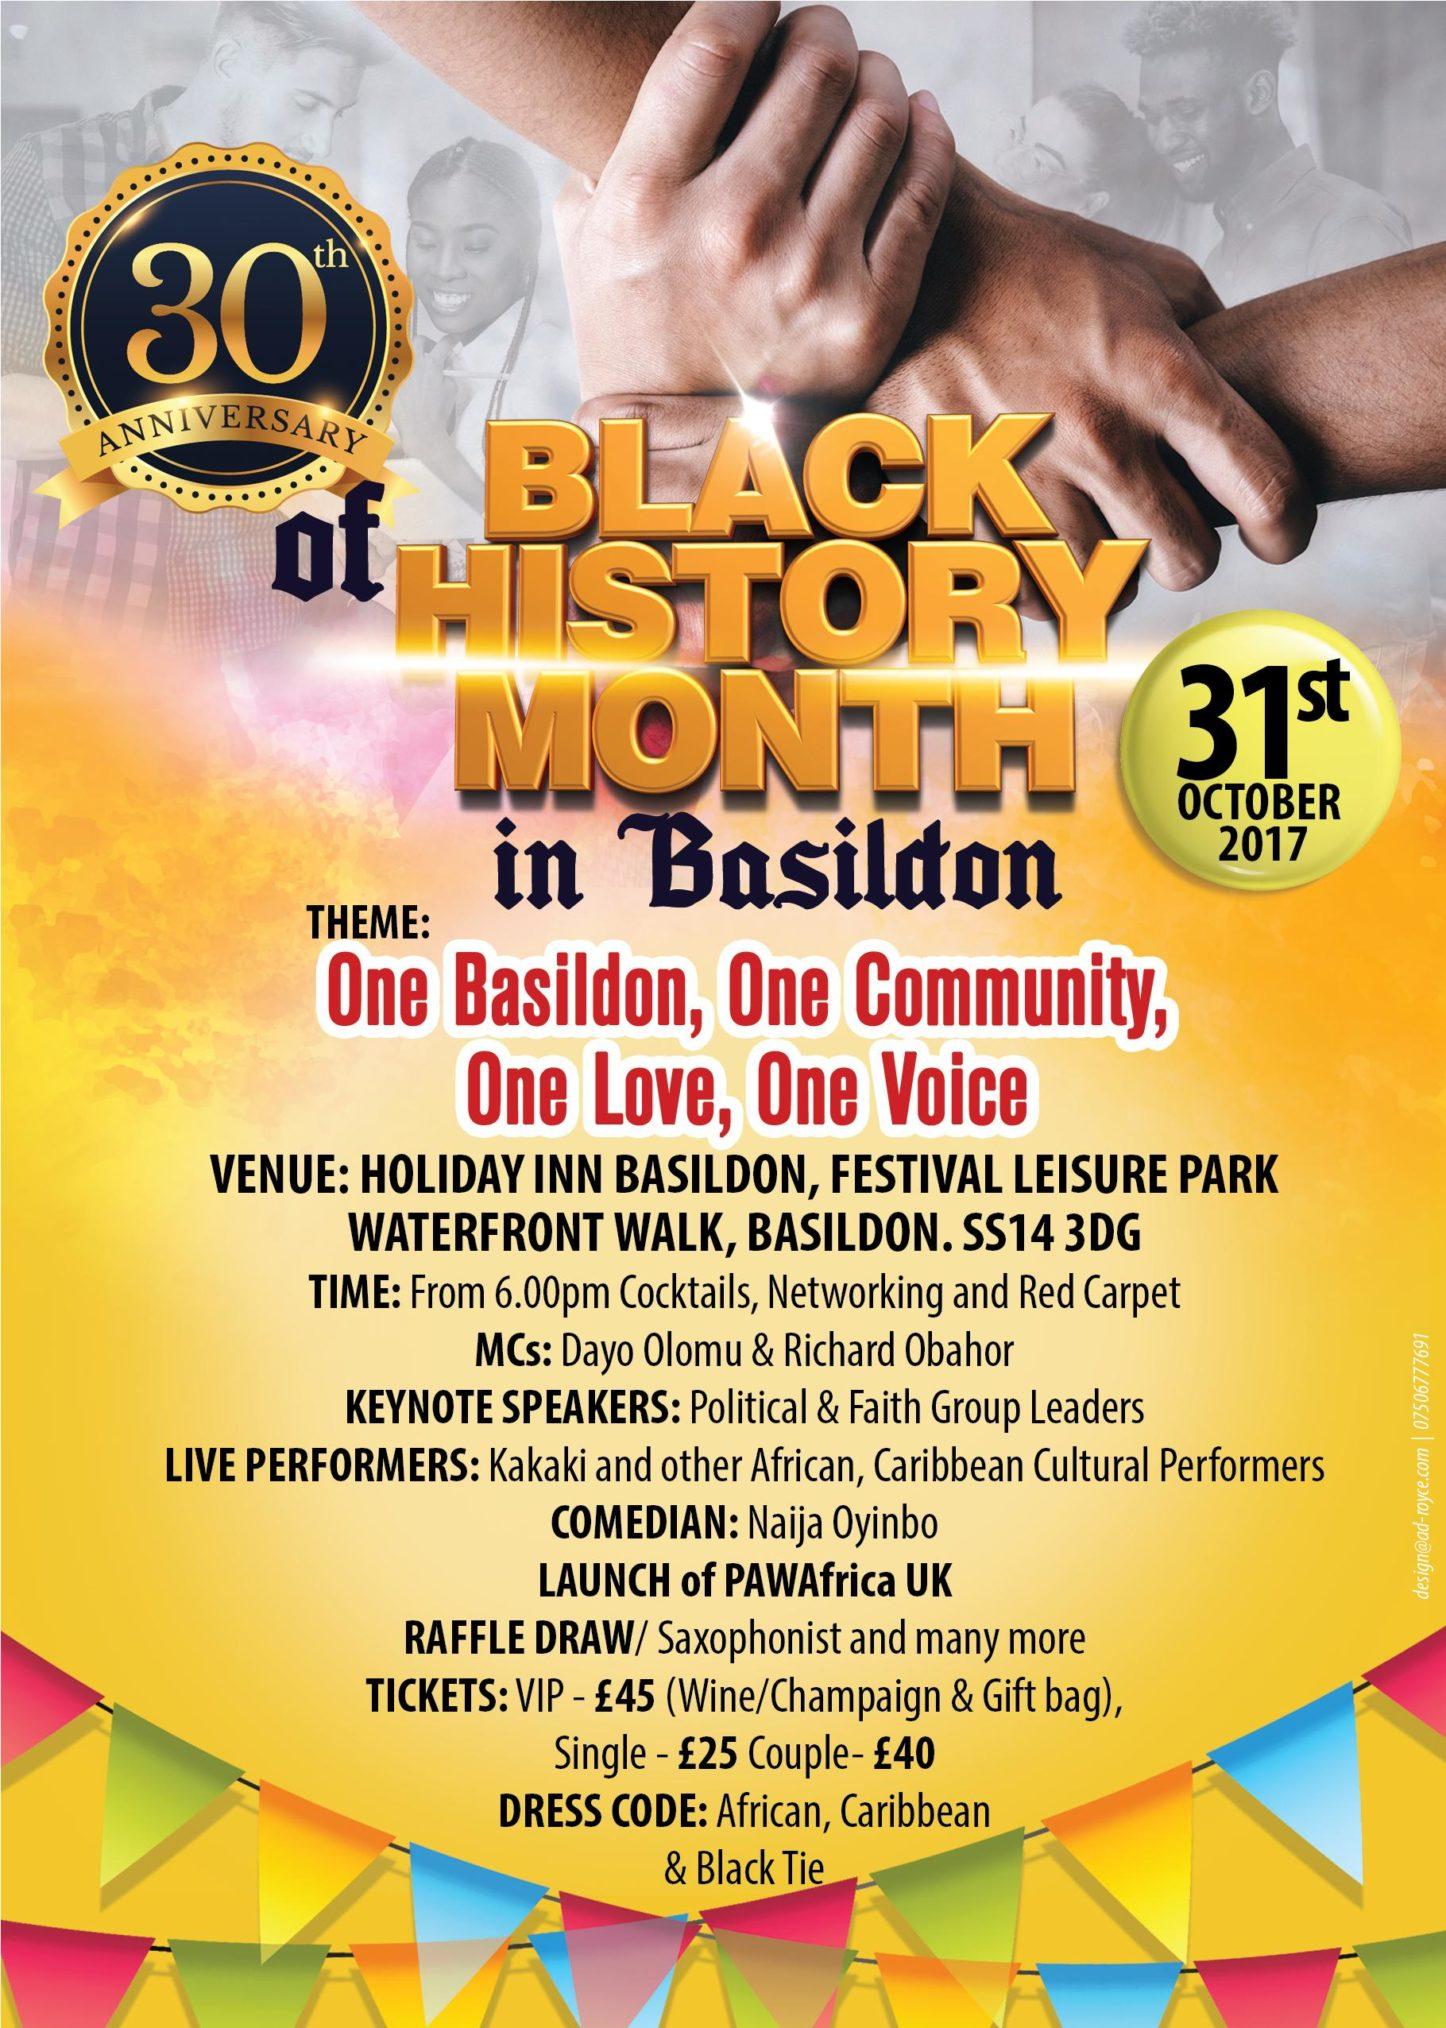 30th Anniversary of Black History Month Celebrations in Basildon | Blacknet UK